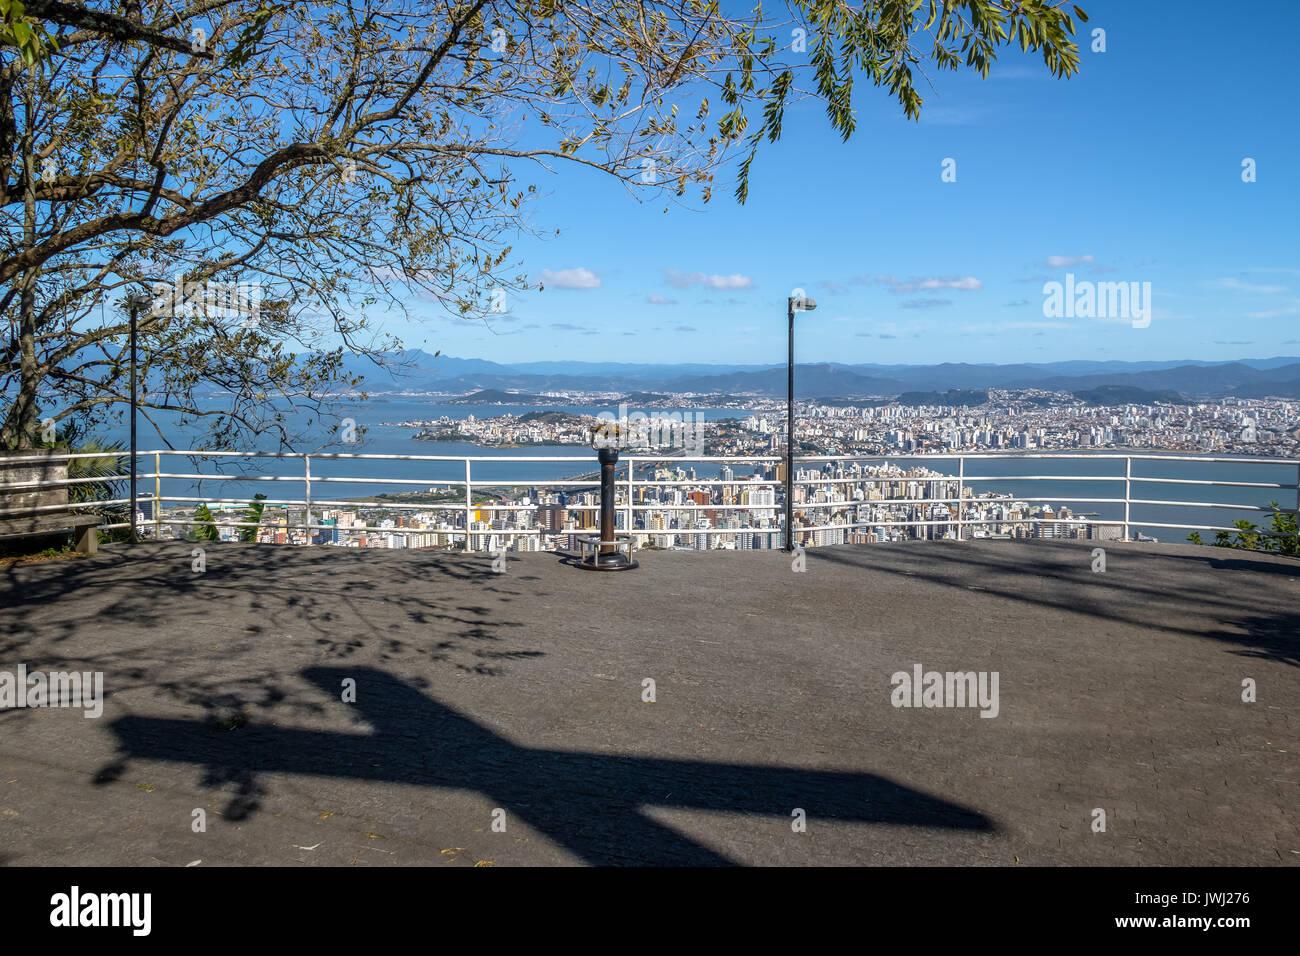 Morro da Cruz Viewpoint and Downtown Florianopolis City view - Florianopolis, Santa Catarina, Brazil - Stock Image